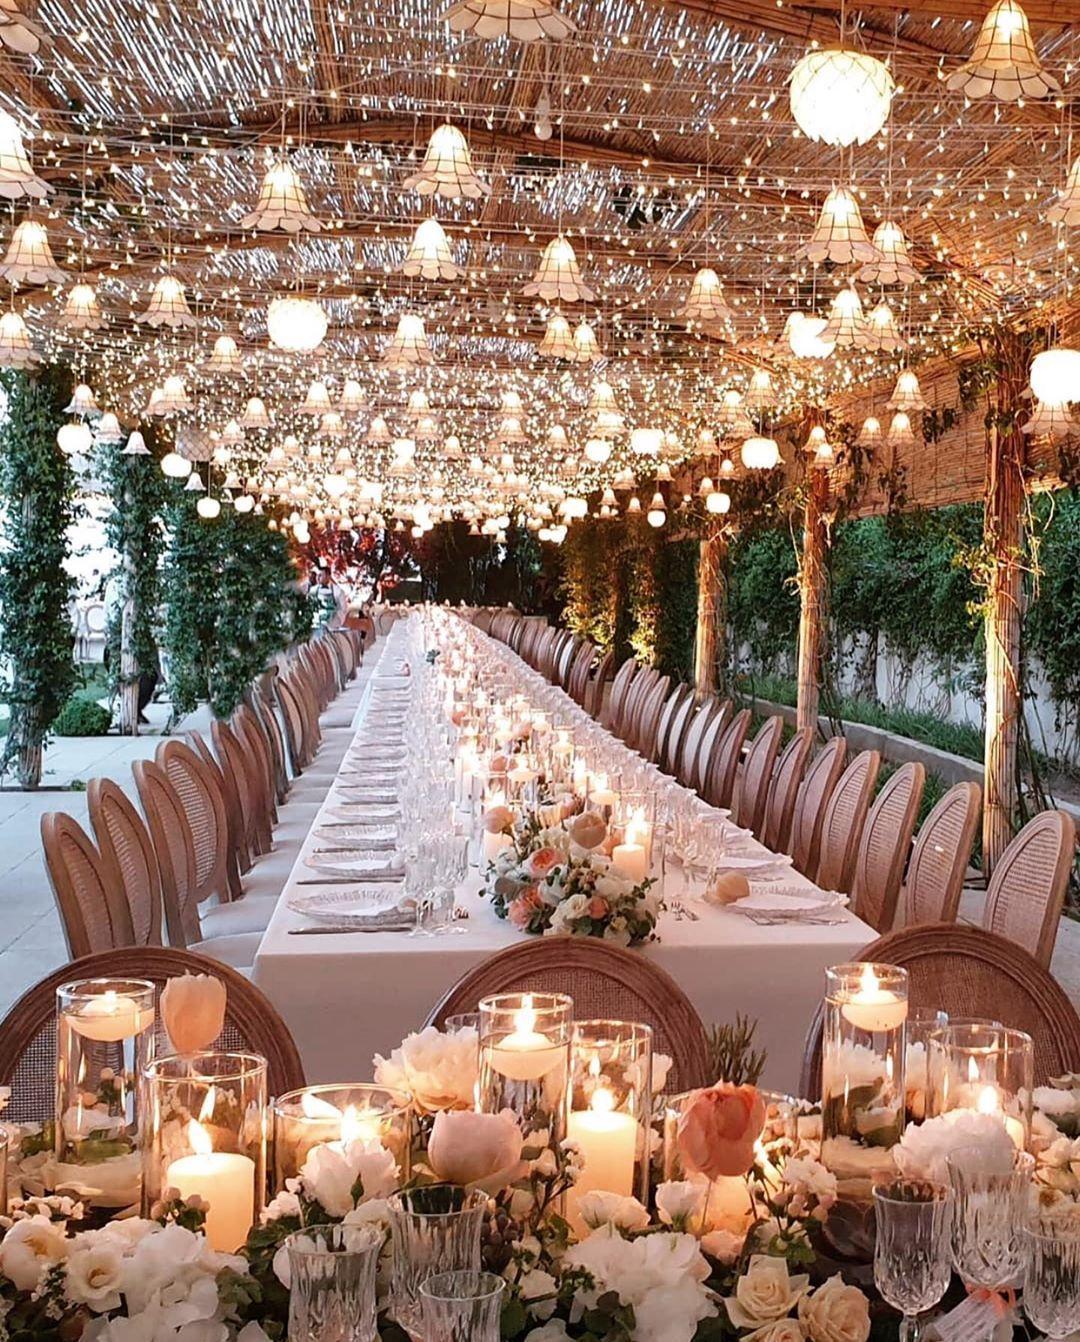 Gorgeous Summer Wedding Decor Repost Weddingforward Follow Them